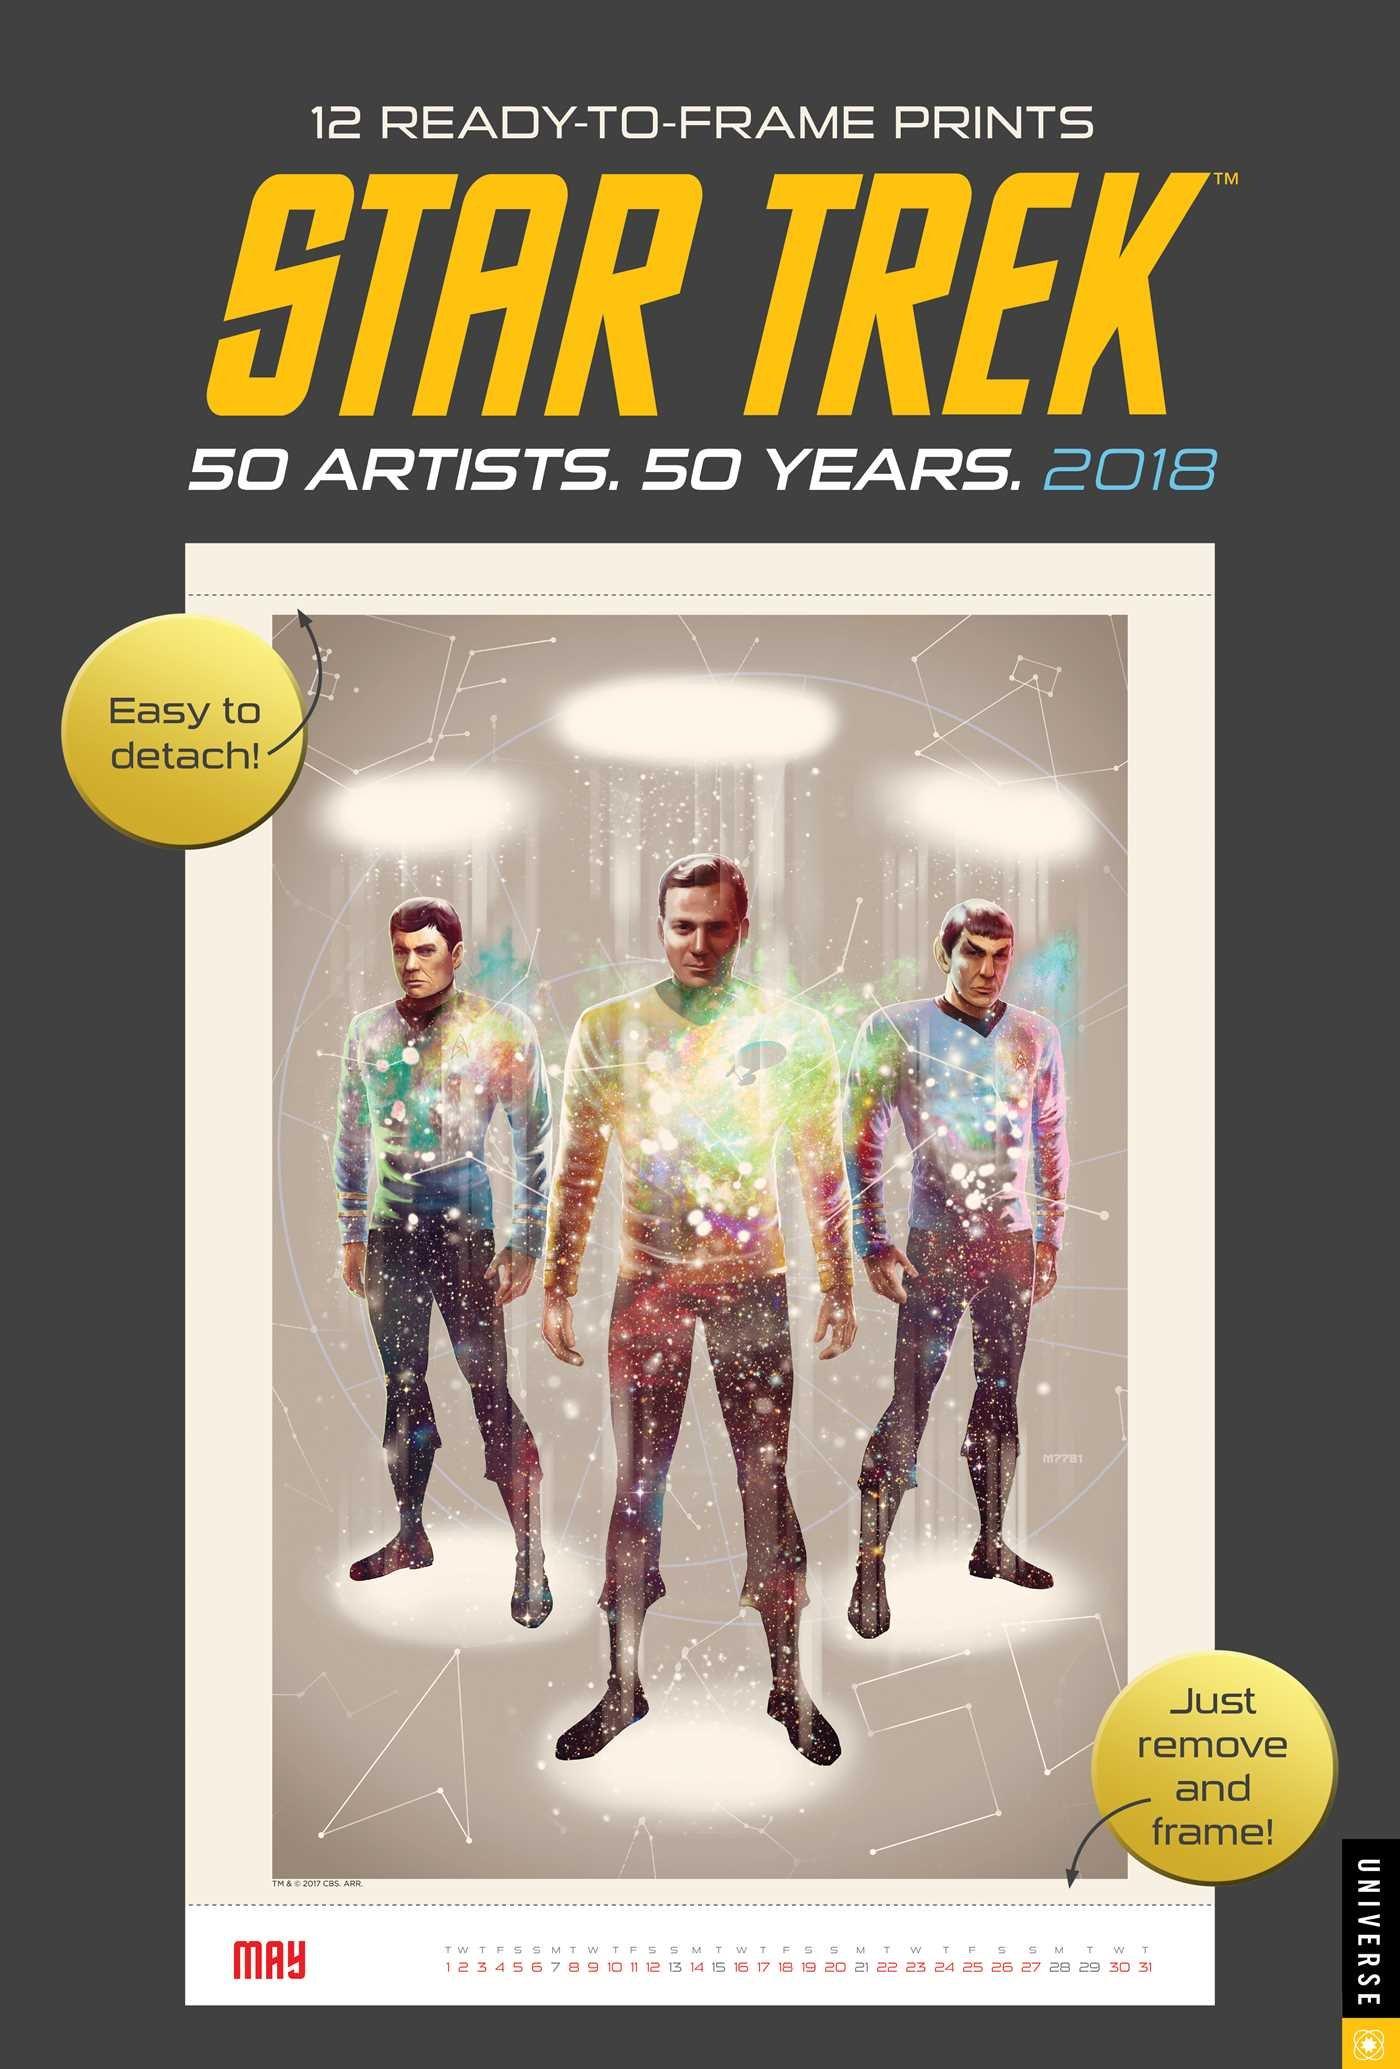 Star Trek 2018 Poster Calendar: 50 Artists. 50 Years. by Universe Publishing